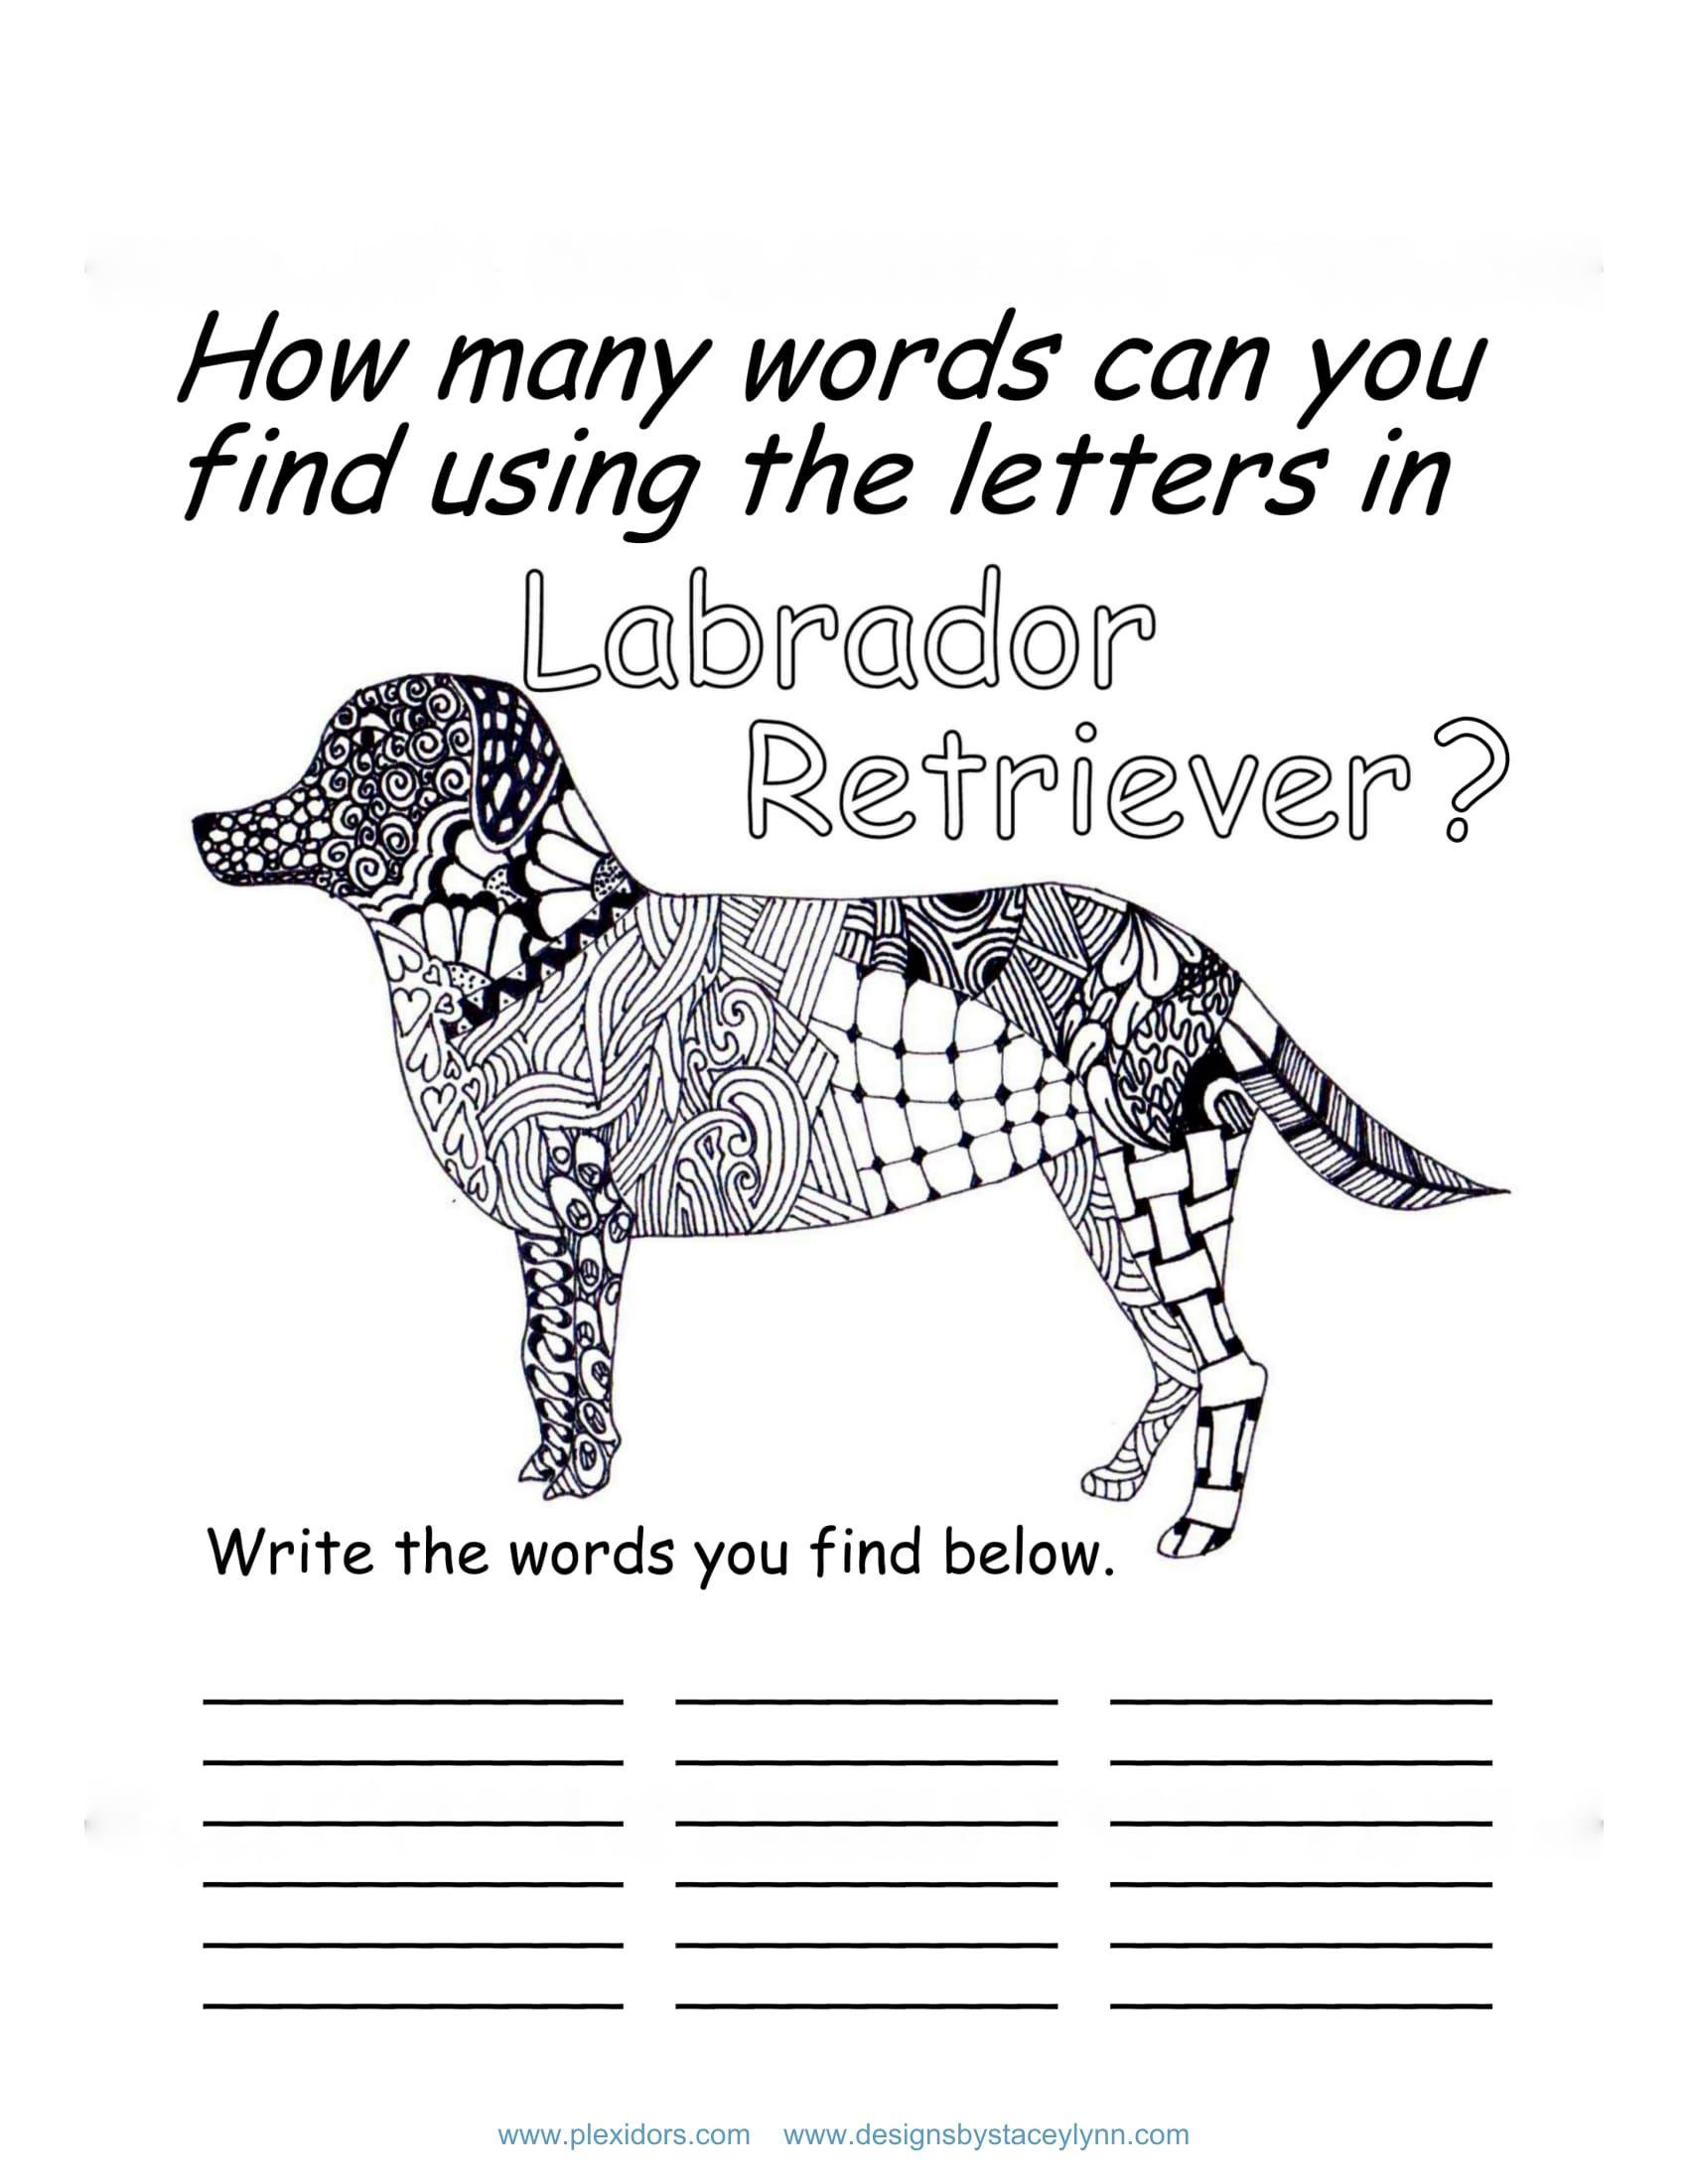 Labrador Retriever Coloring Page And Word Scramble